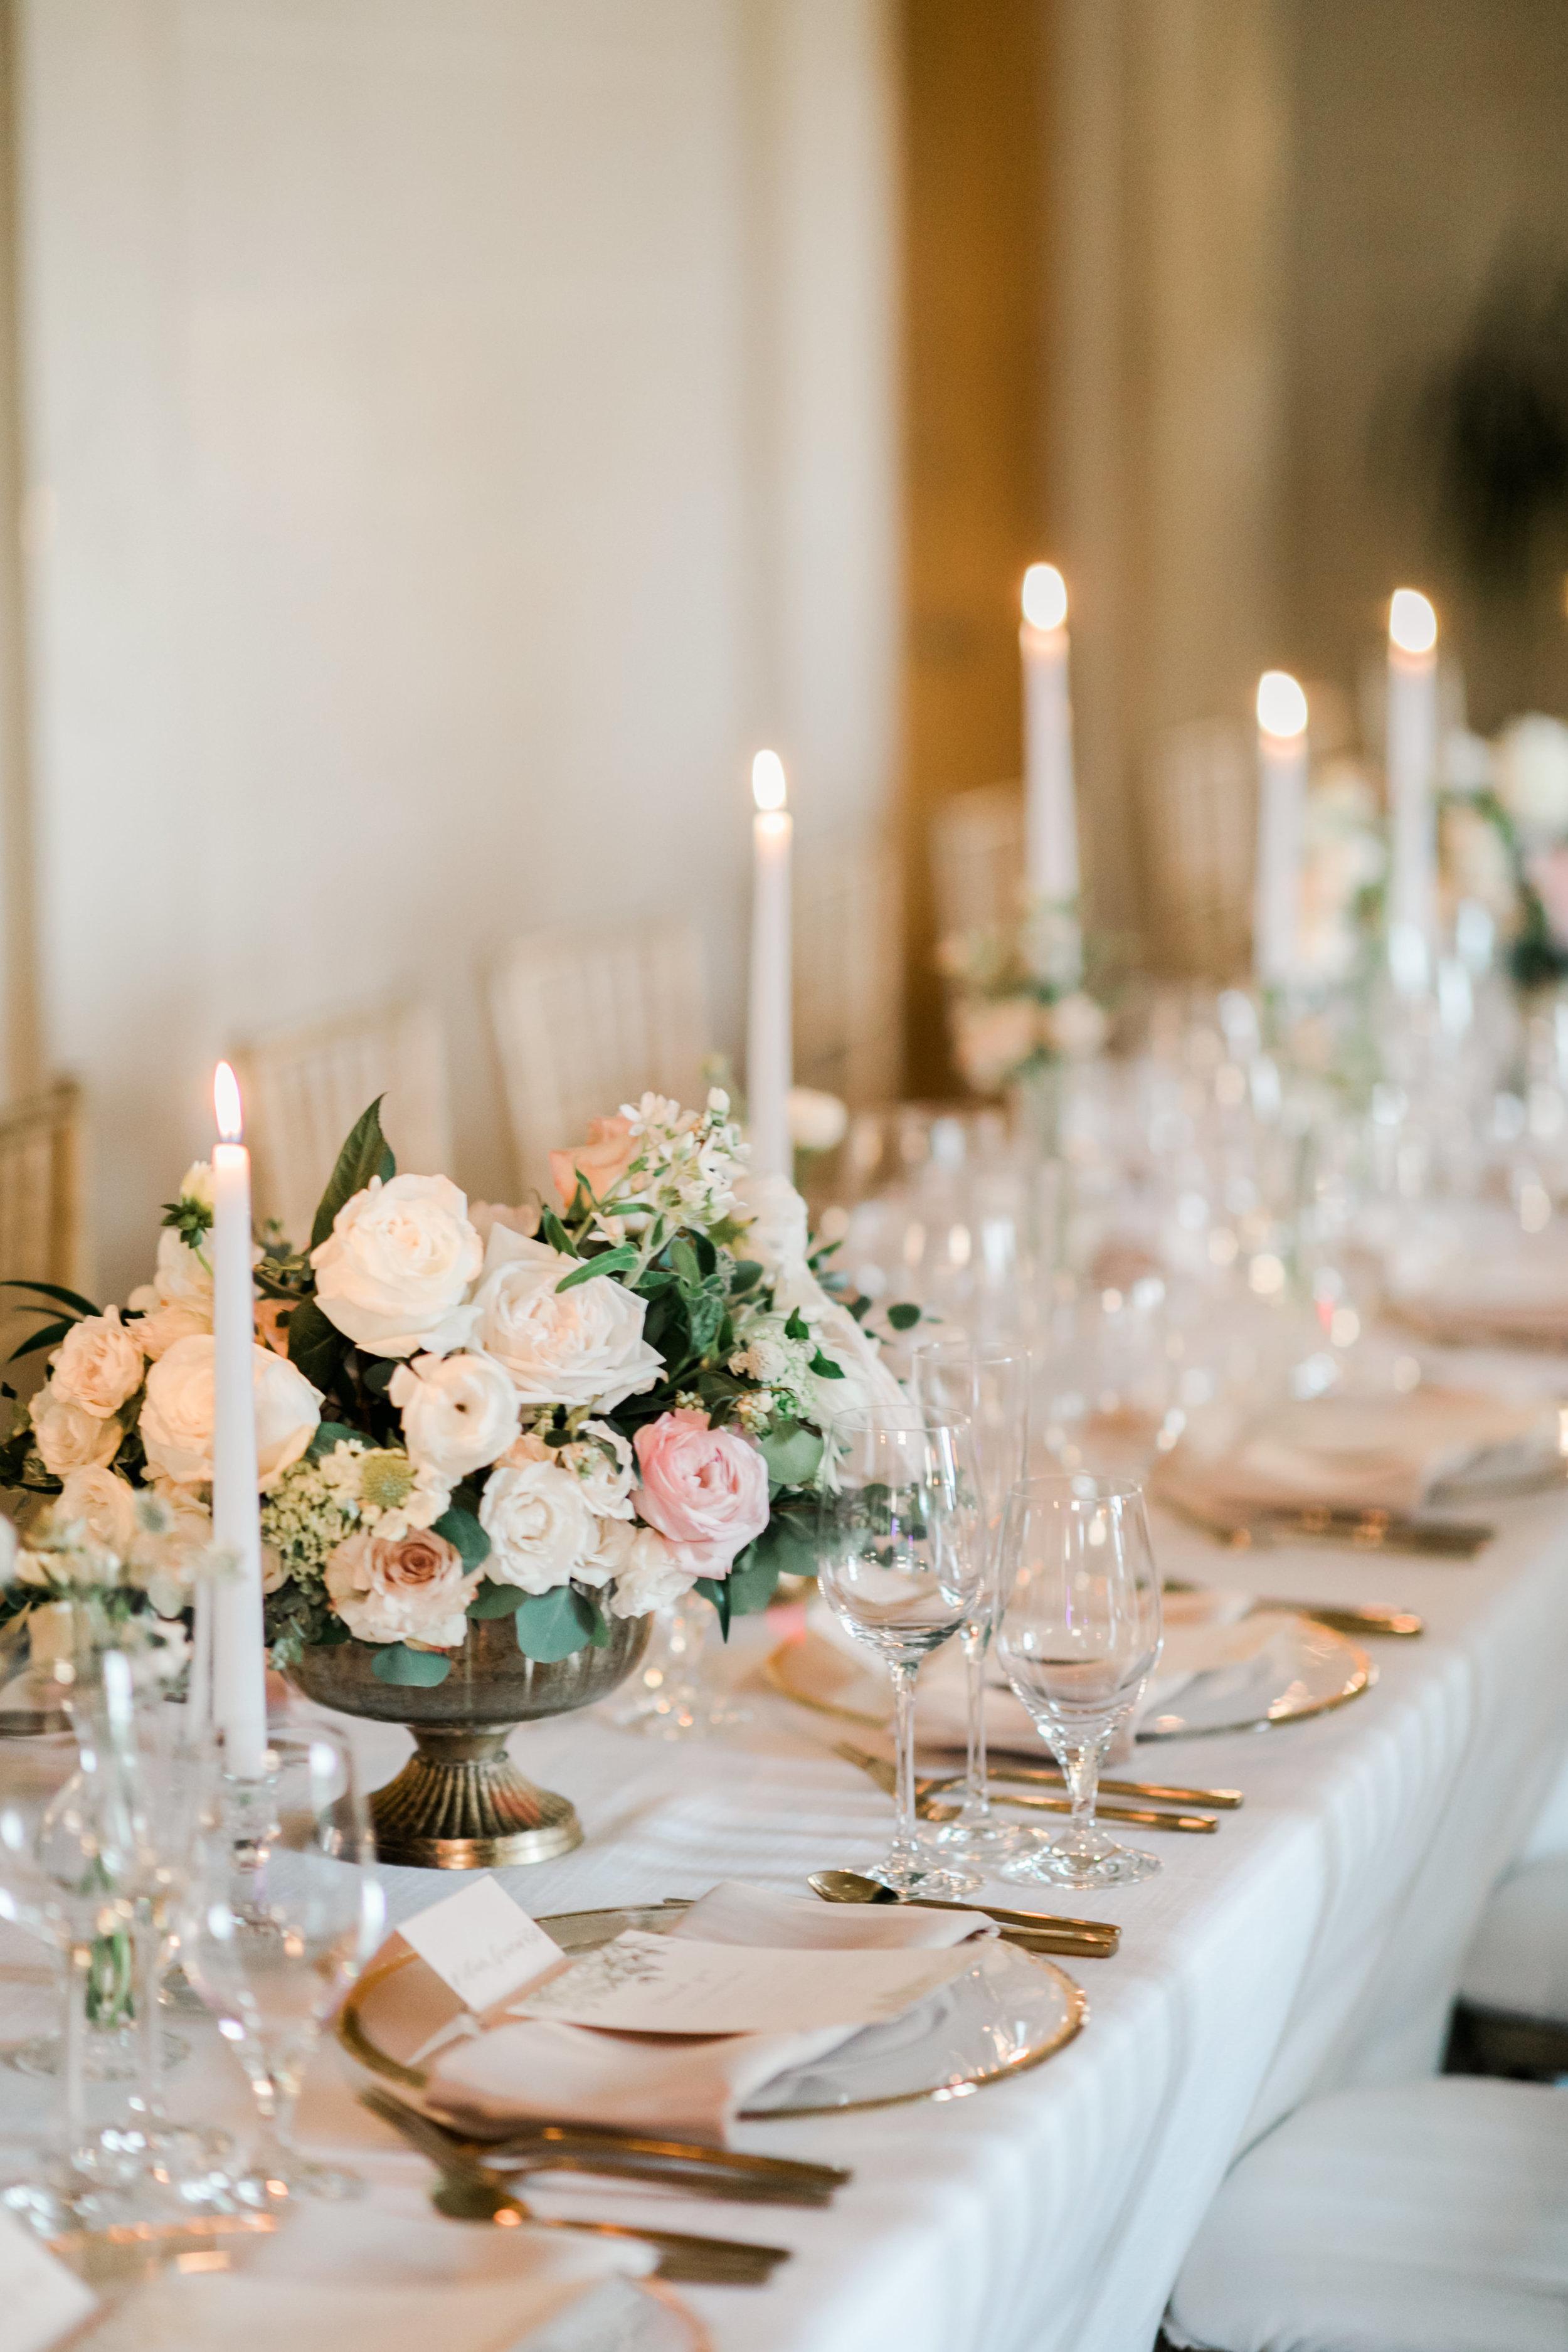 The Mansion at Woodward Park Tulsa Oklahoma Wedding_Valorie Darling Photography-9913.jpg